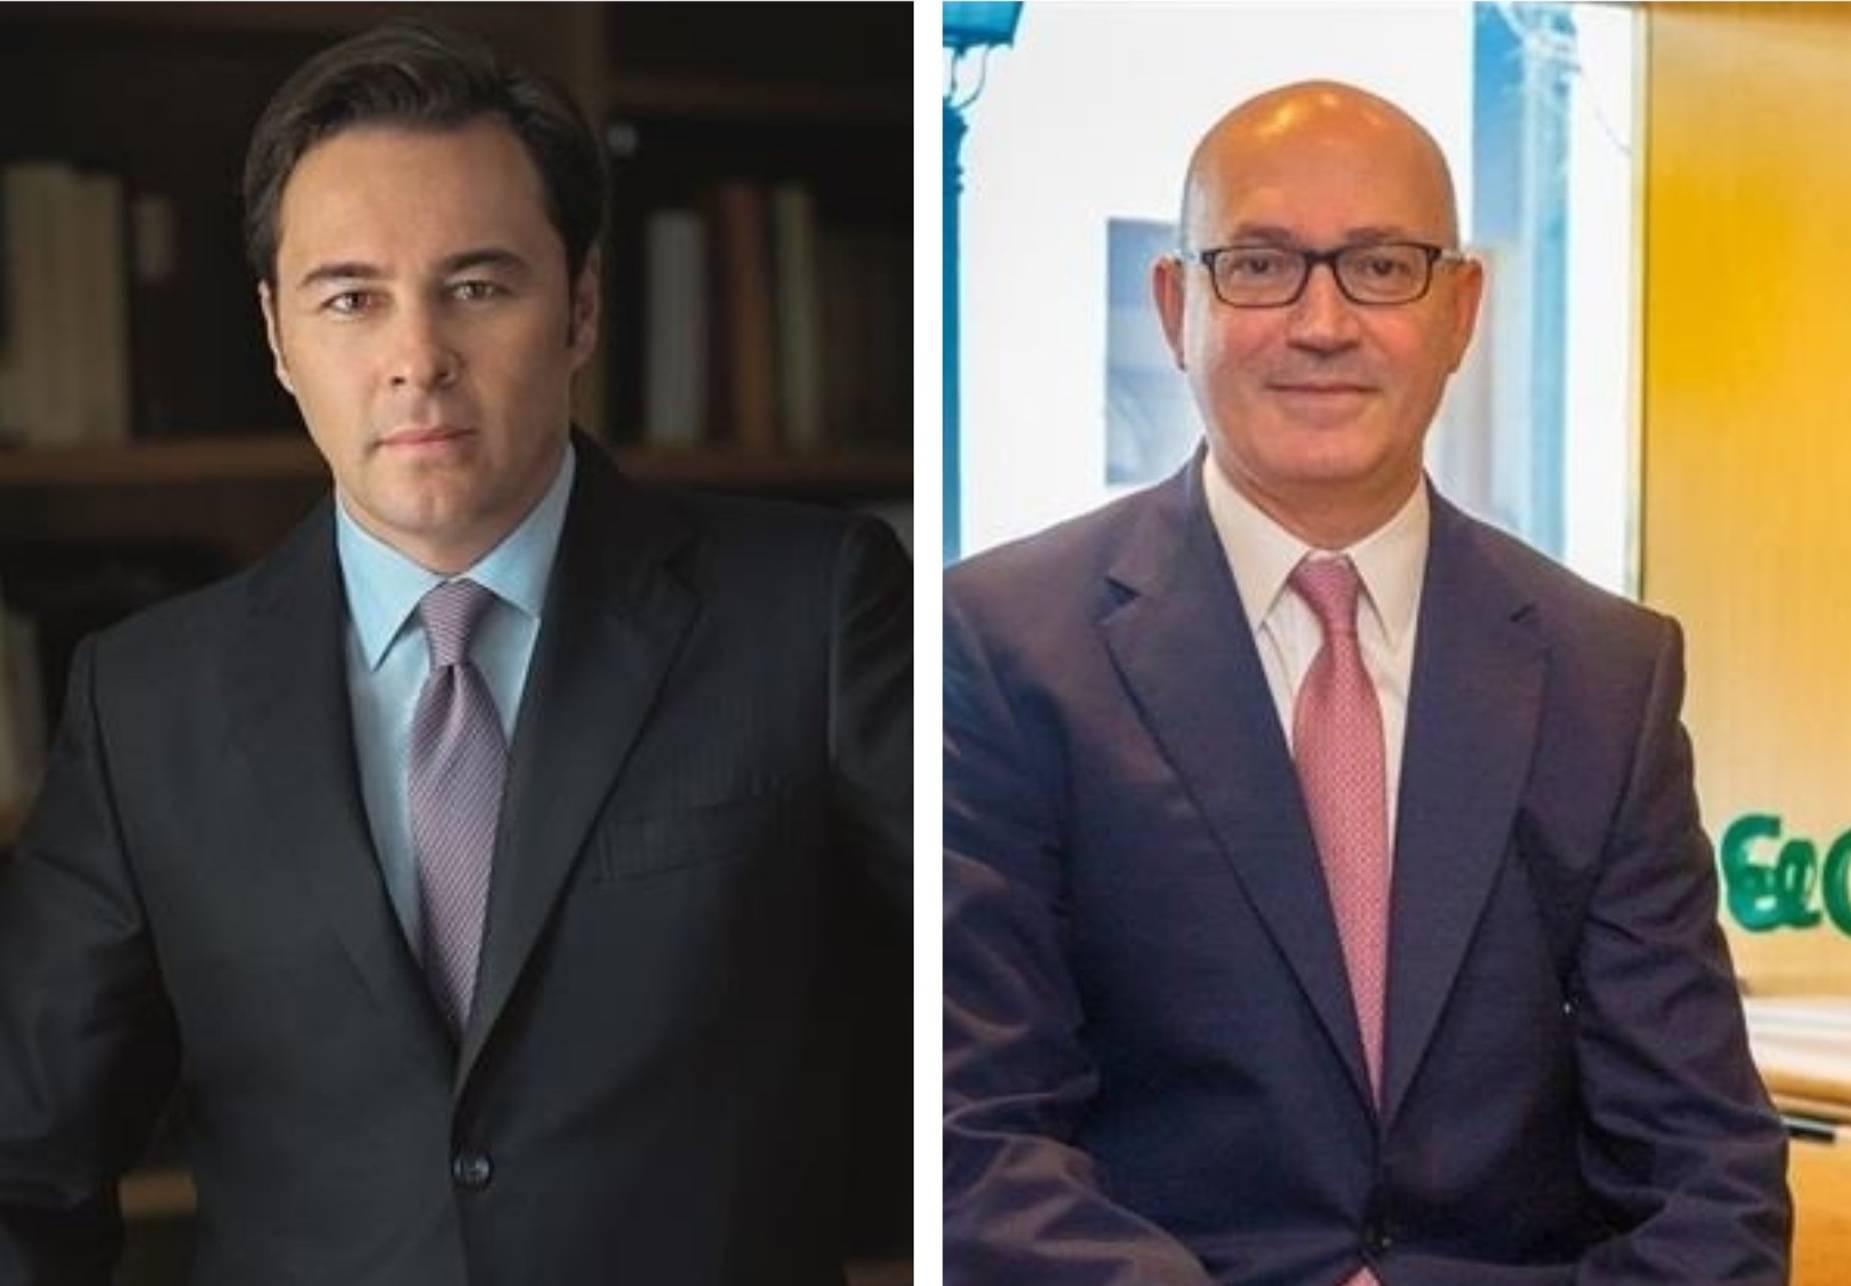 Dimas Gimeno y Jesús Nuño de la Rosa  - FOTO: Europa Press